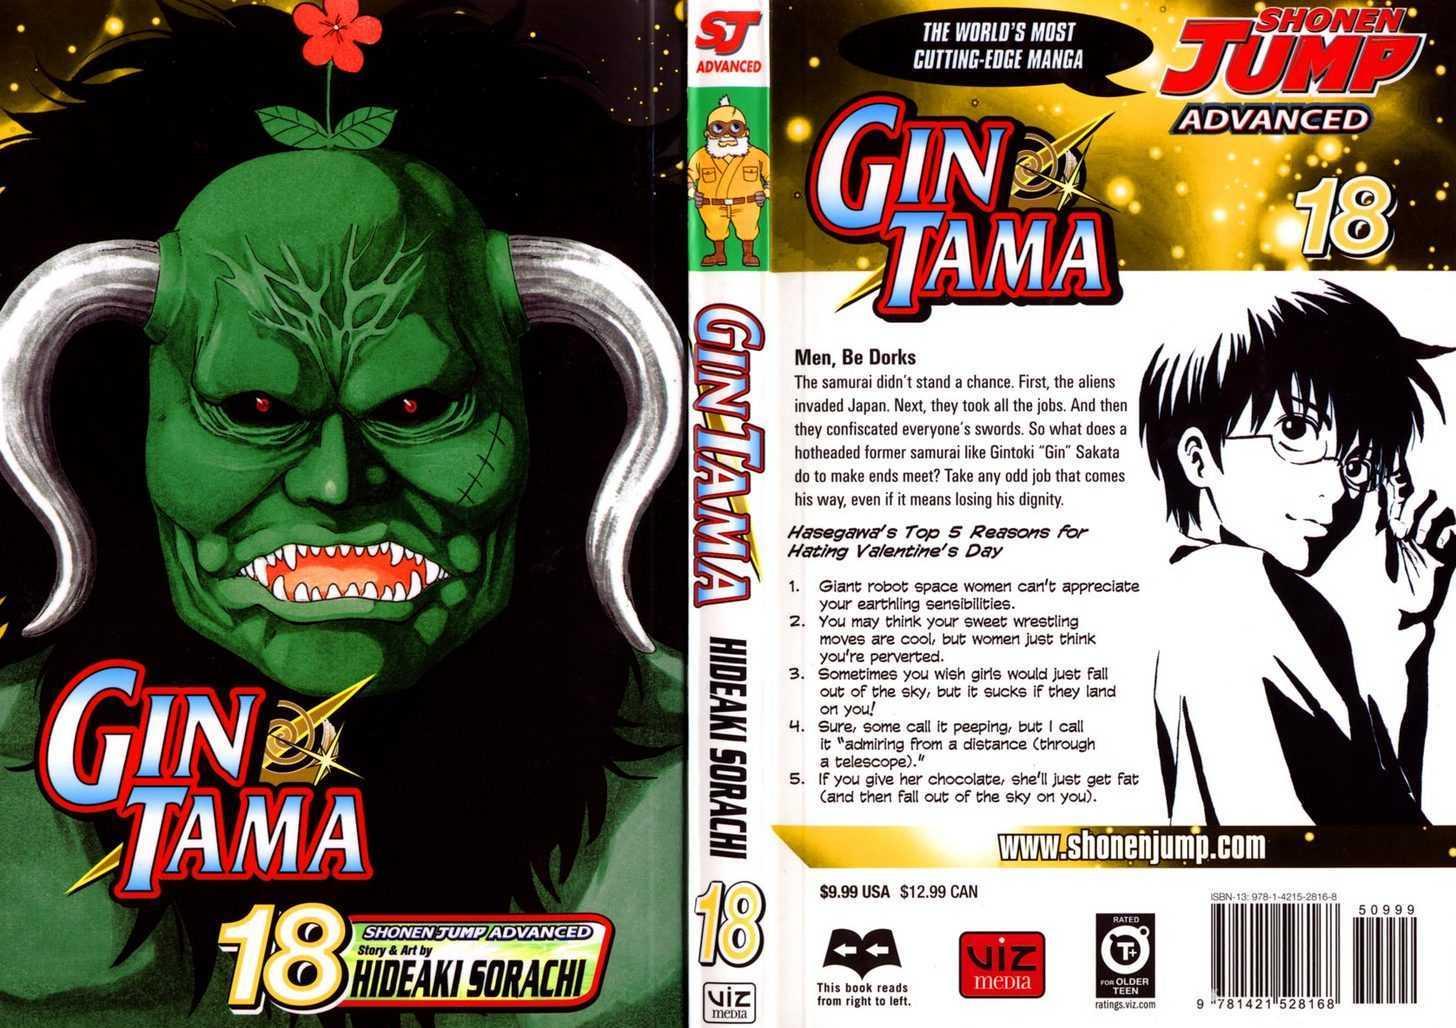 http://im.nineanime.com/comics/pic9/18/210/16657/Gintama1490715.jpg Page 1